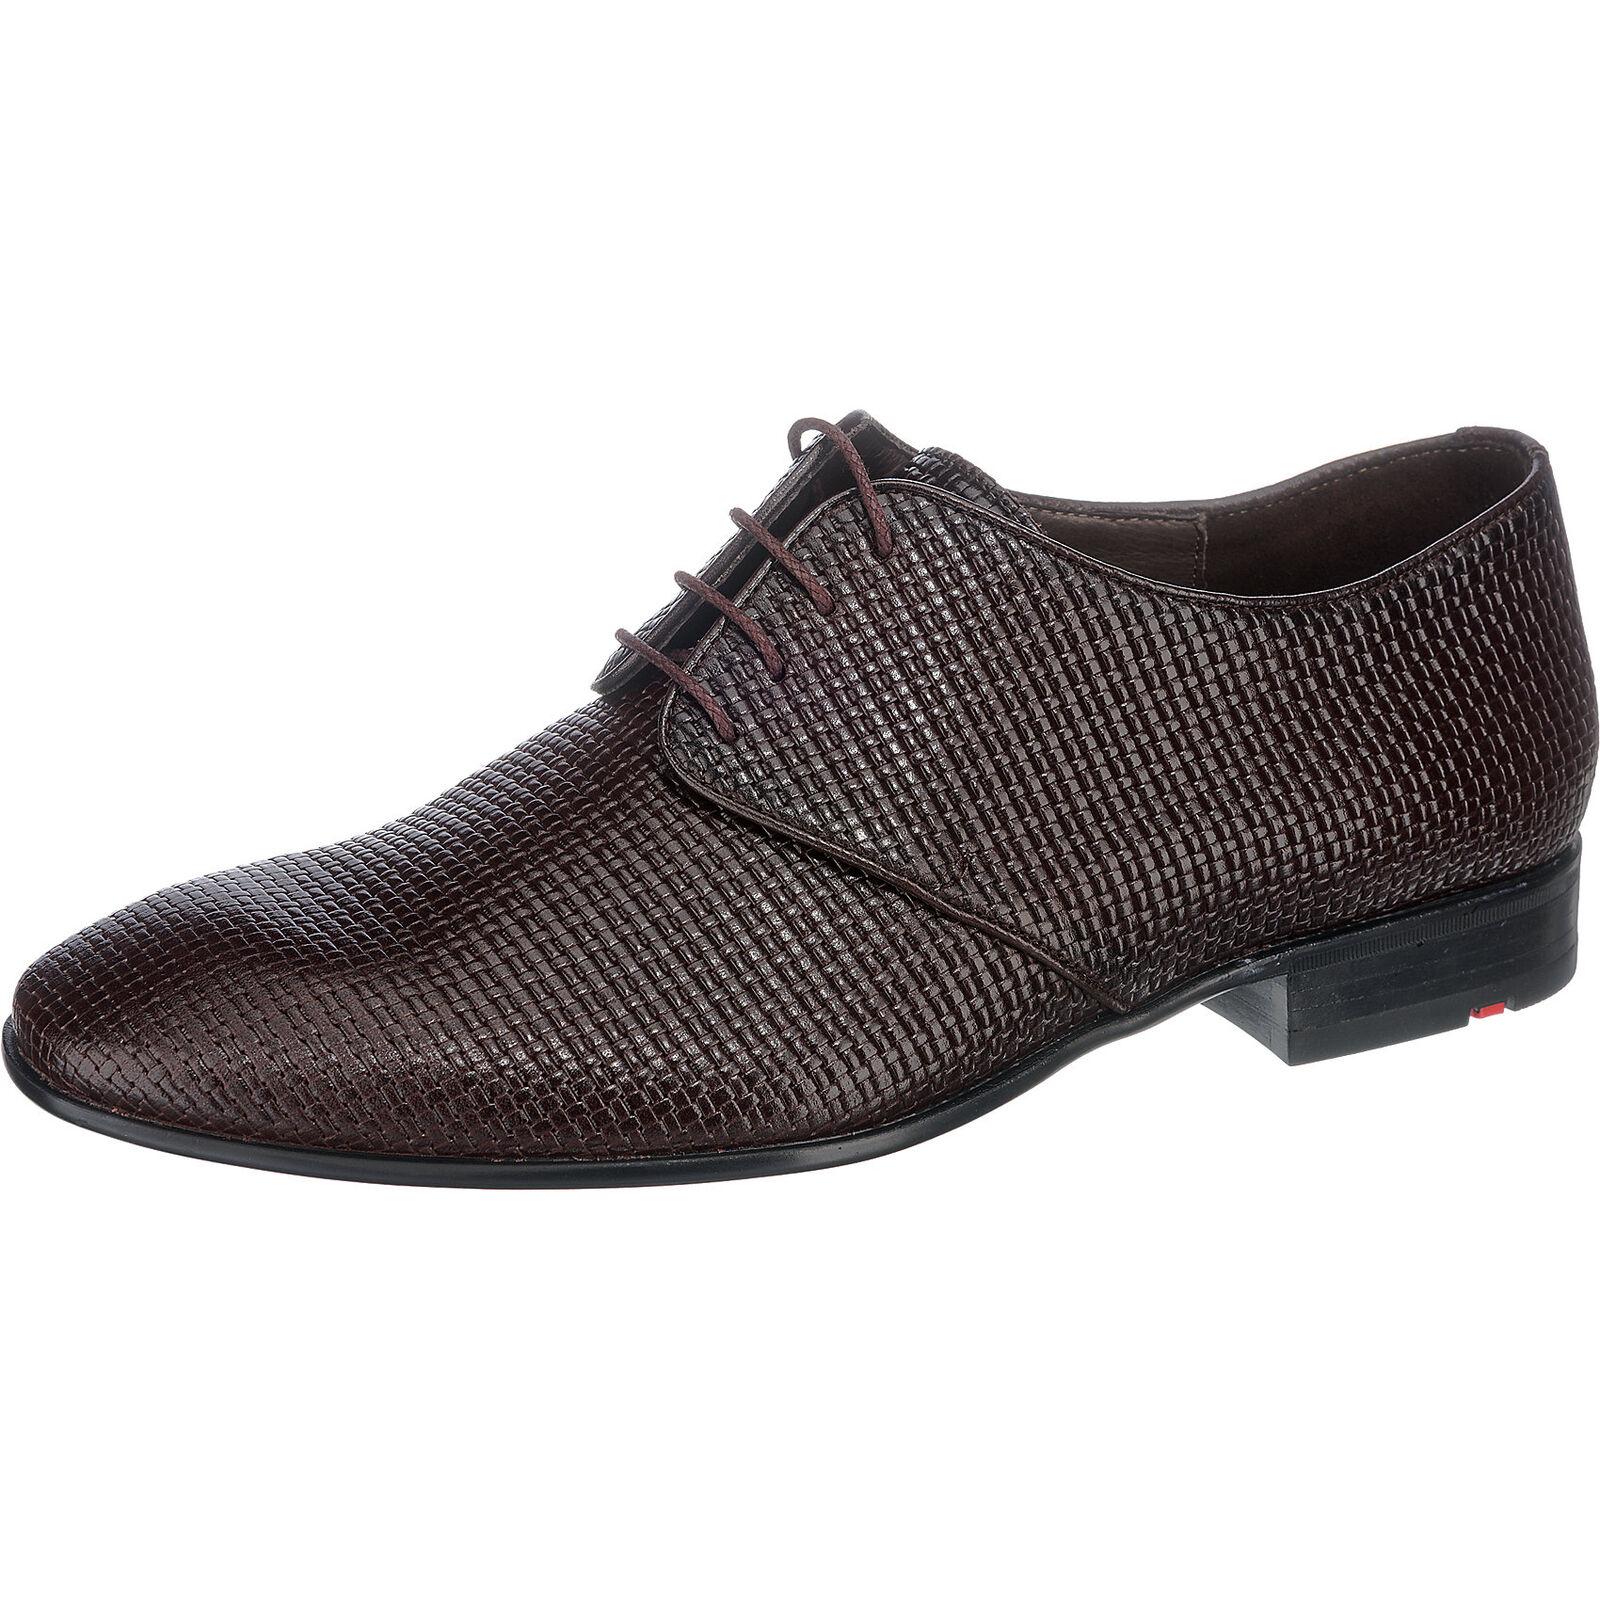 Neu LLOYD Olcar Business Schuhe 5767360 für Herren dunkelbraun